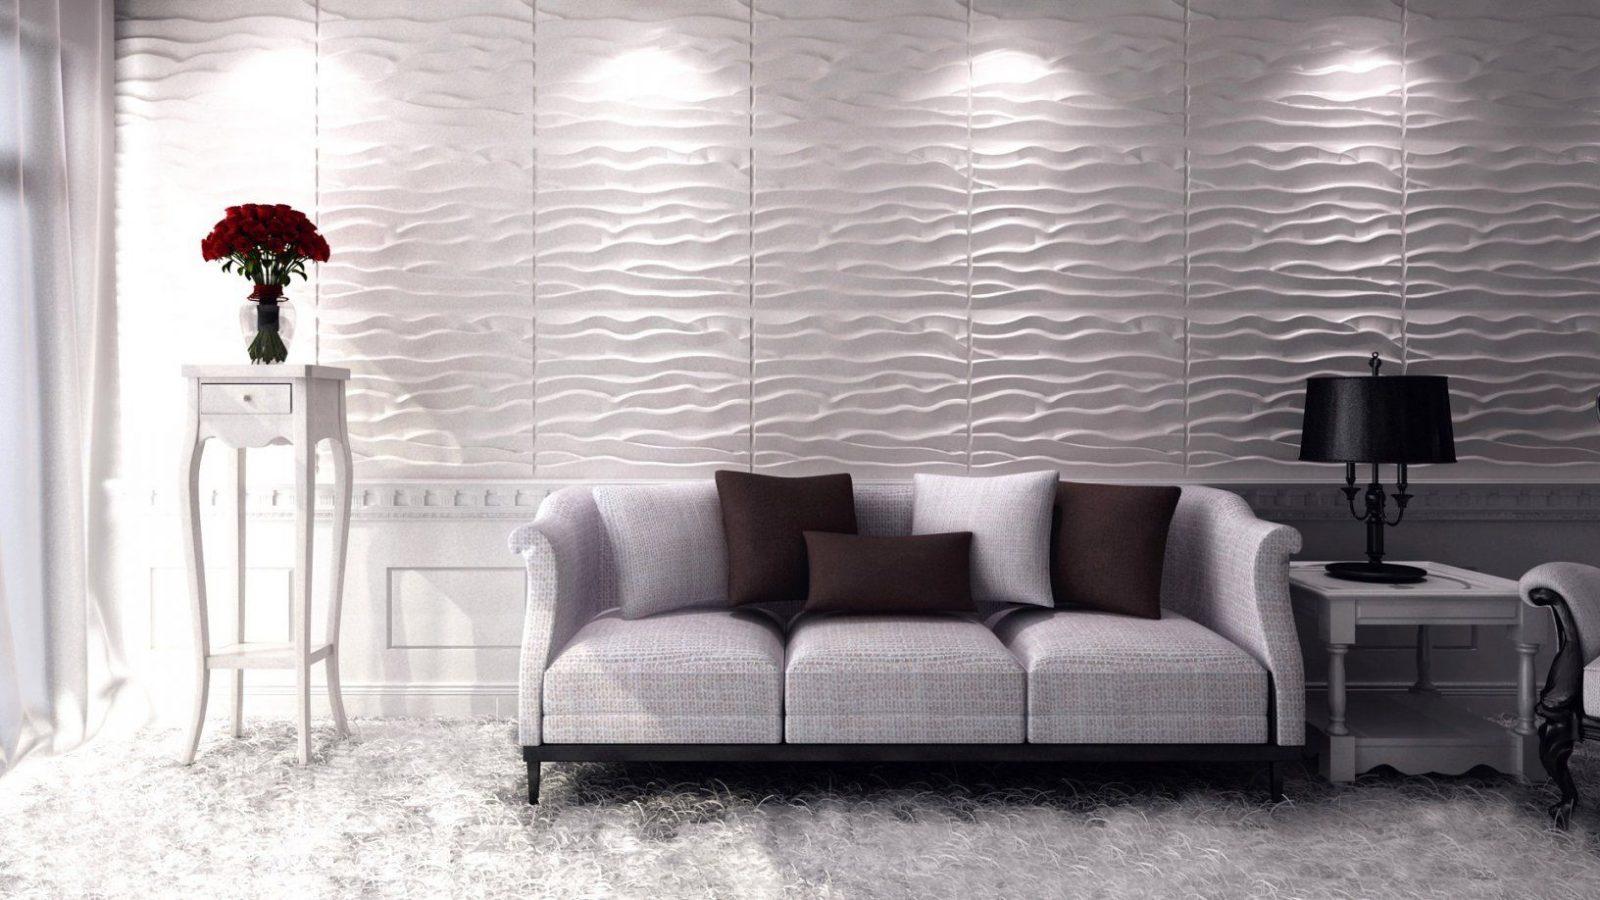 Tapeten Idee Fr Wohnzimmer Beauteous Wohnzimmer Idee Tapete  Wohndesign von Tapeten Wohnzimmer Ideen 2016 Bild